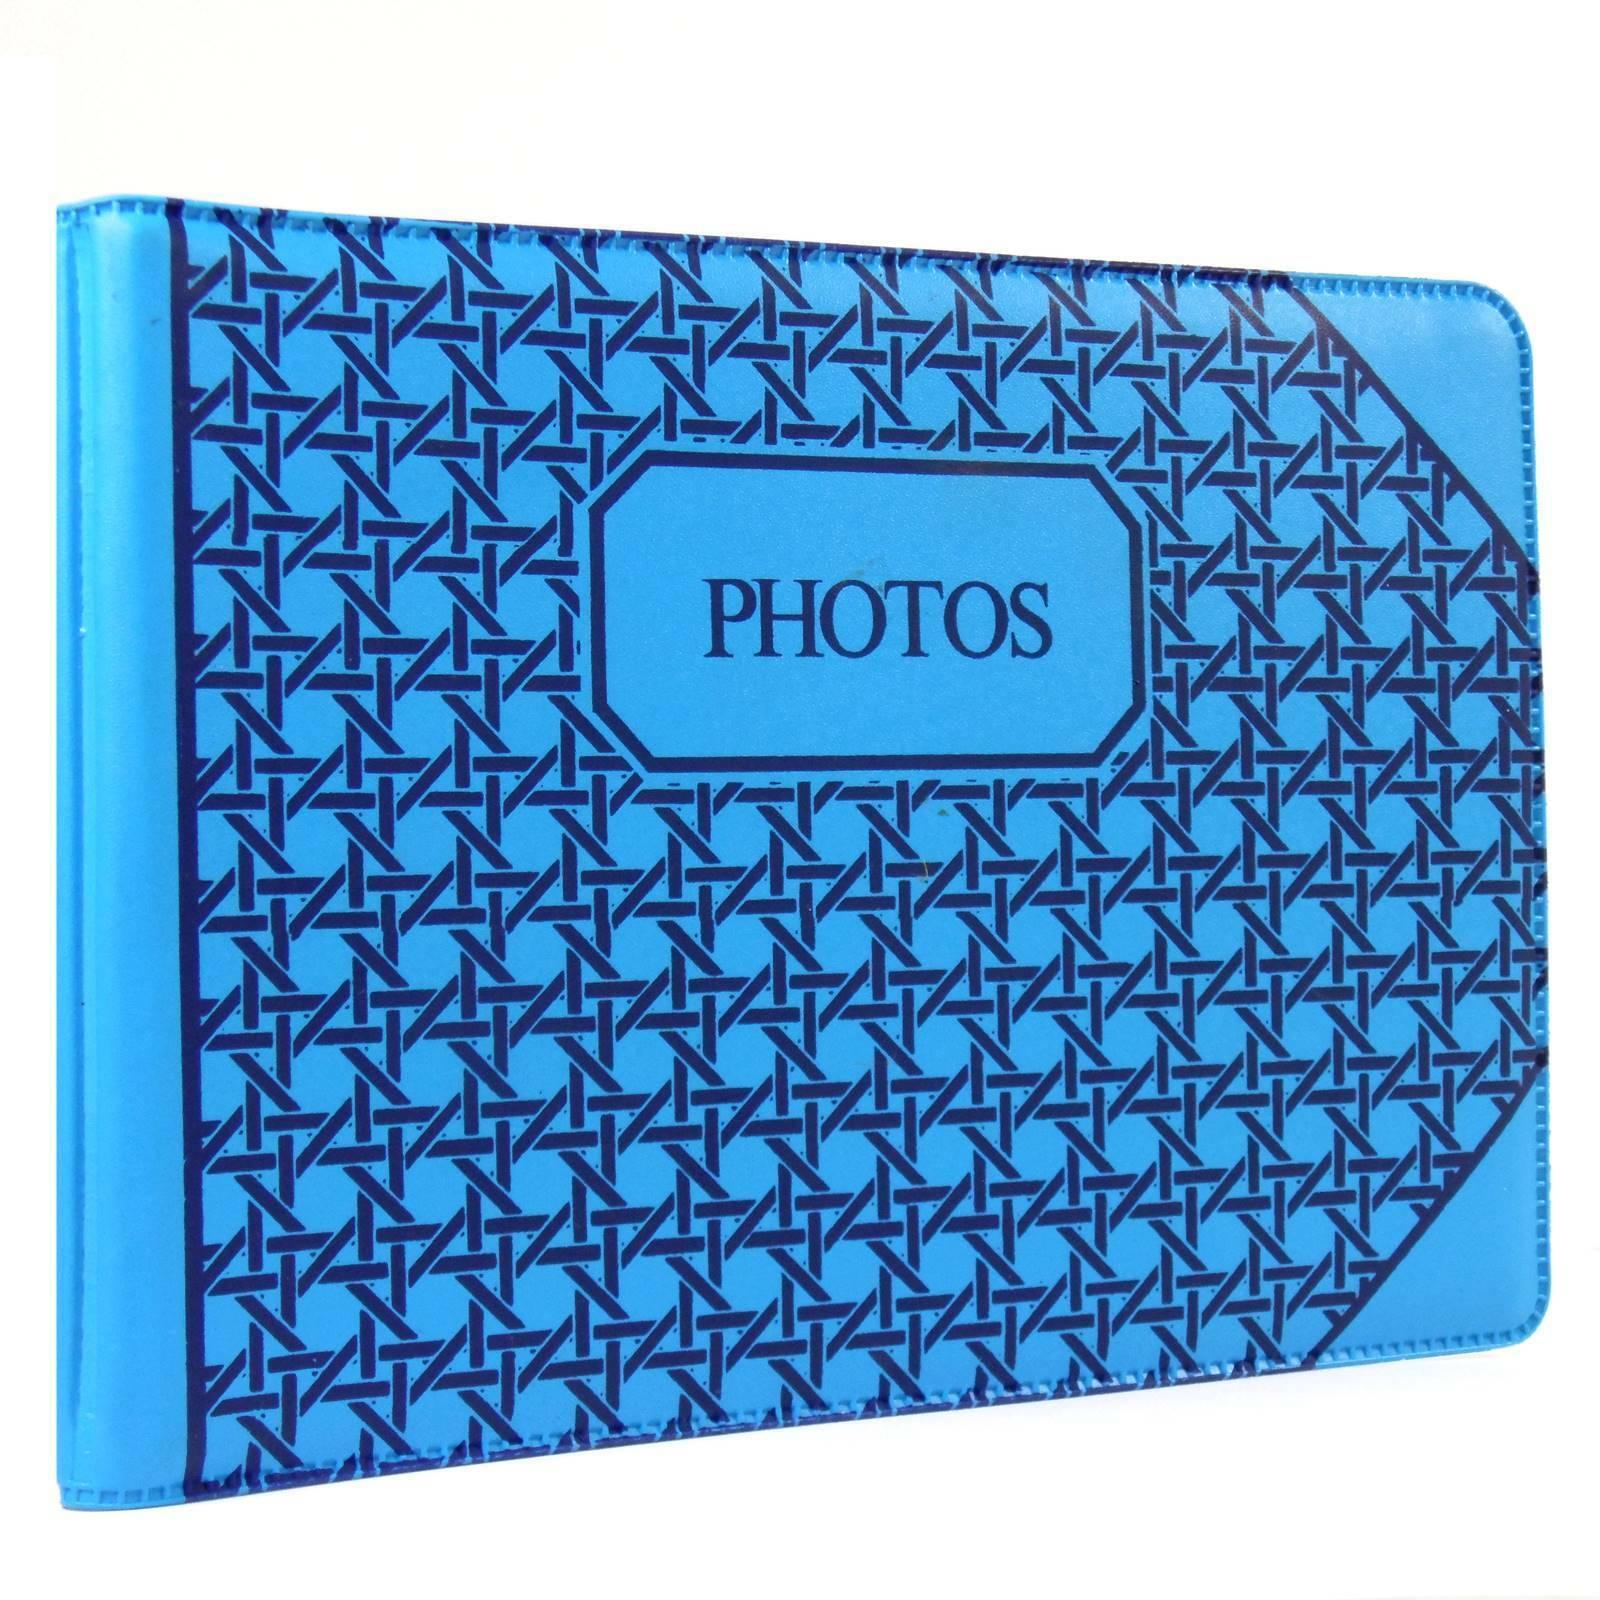 1 x 35mm Photo Album 6x4 Postcard Size Slip In Design Holds 24 Prints